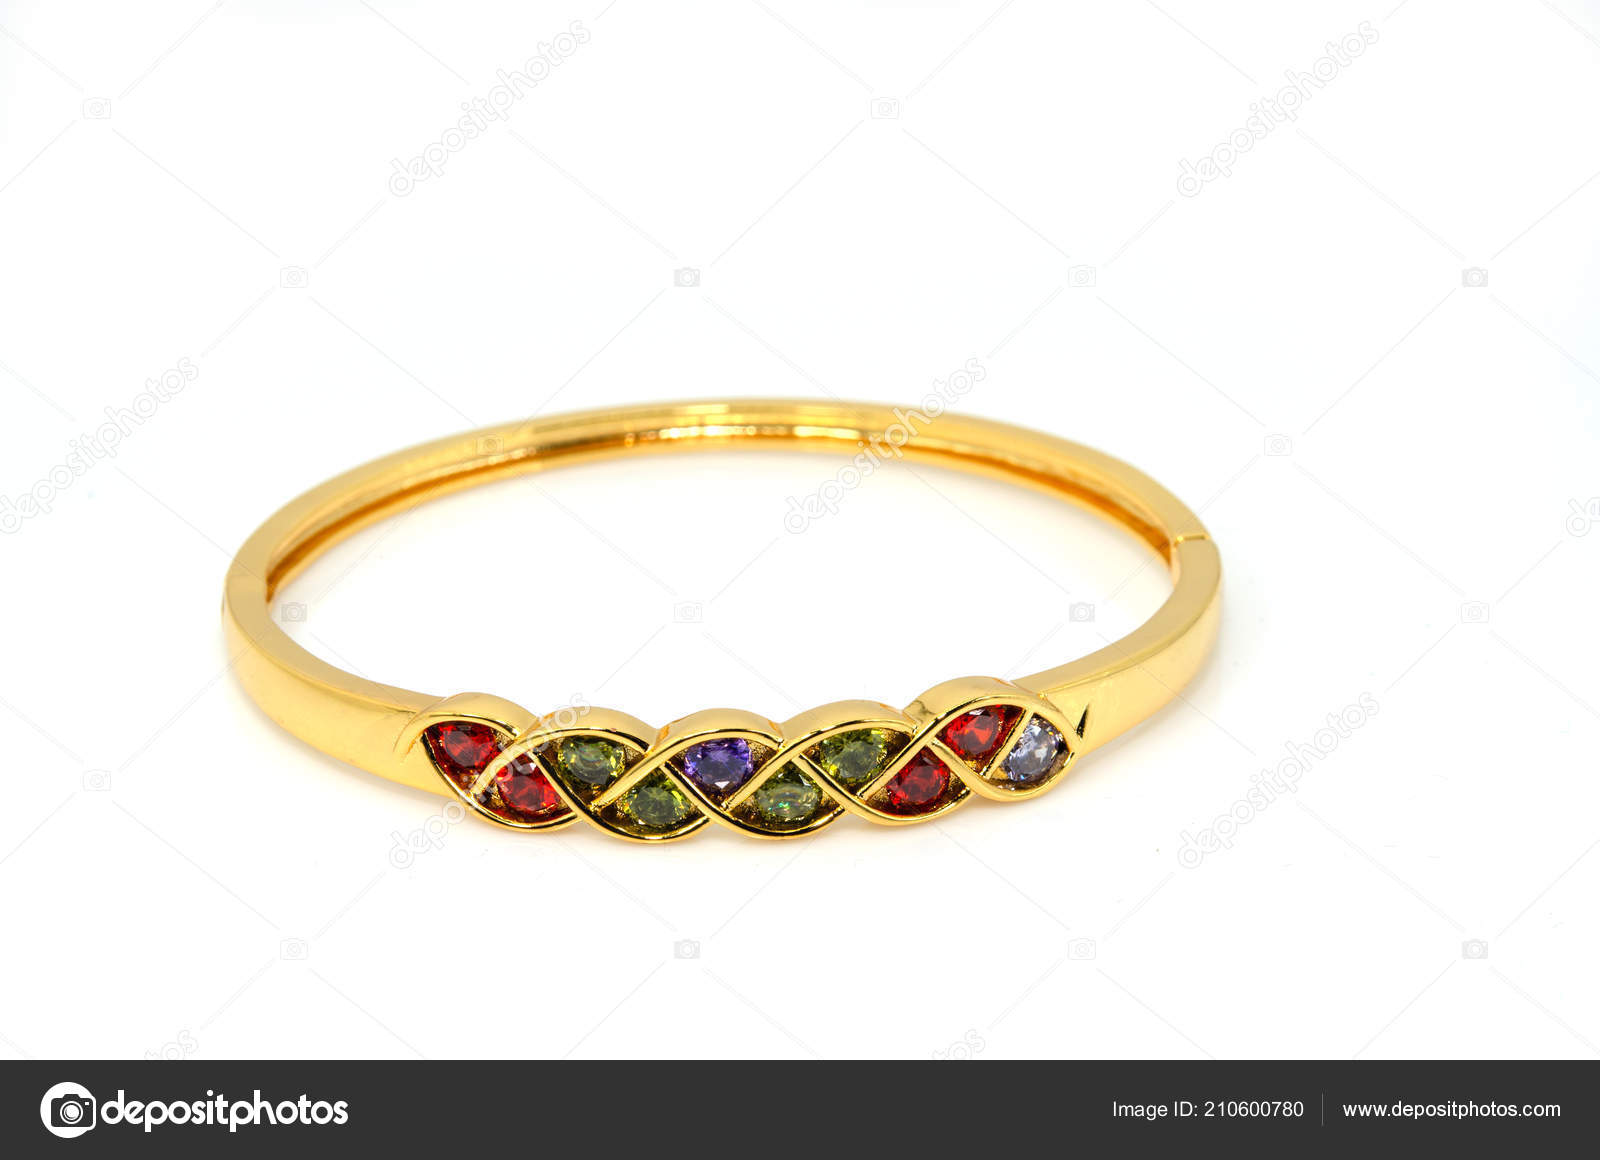 fd6ff2ba43 Μόδα Κοσμήματα Βραχιόλια Για Γυναίκες Λευκό Φόντο — Φωτογραφία Αρχείου